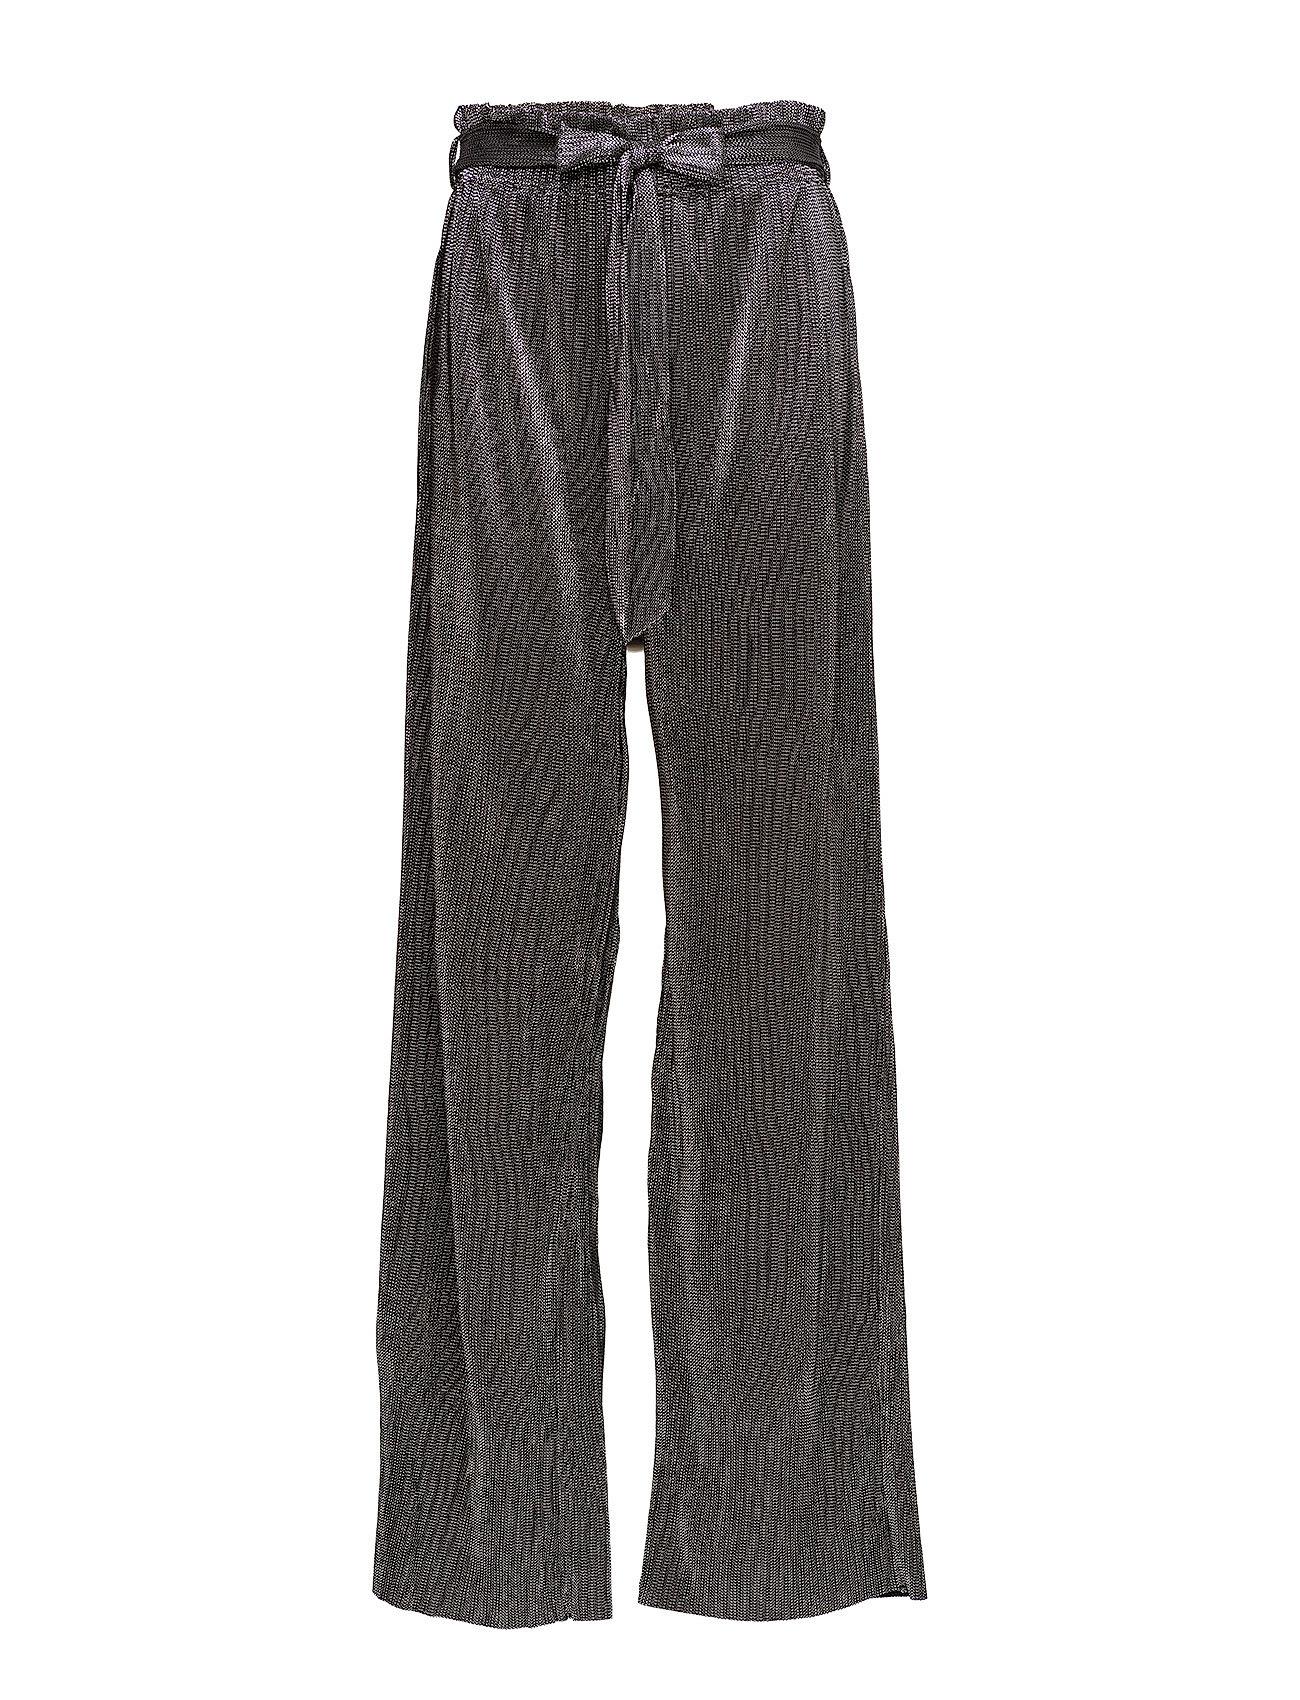 Metallic Pleated Trousers (2789555611)